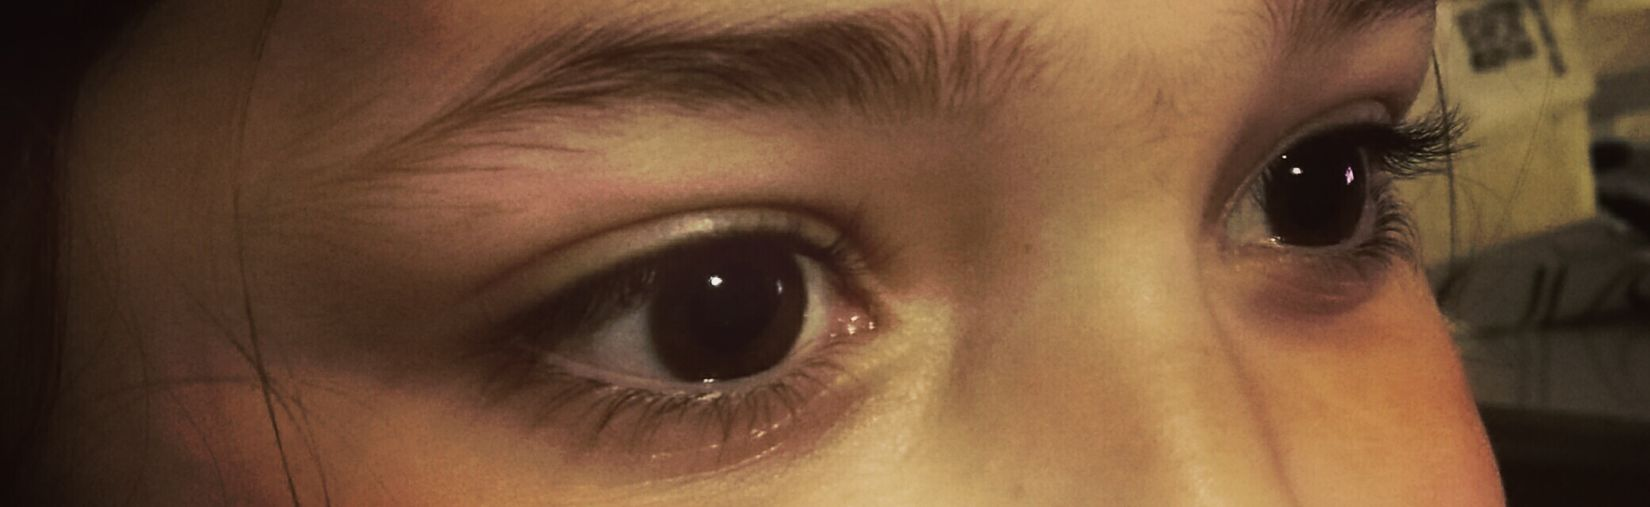 Human Eye Eyes Women Sguardo  Sguardi Sguardoprofondo Sguardi Intensi